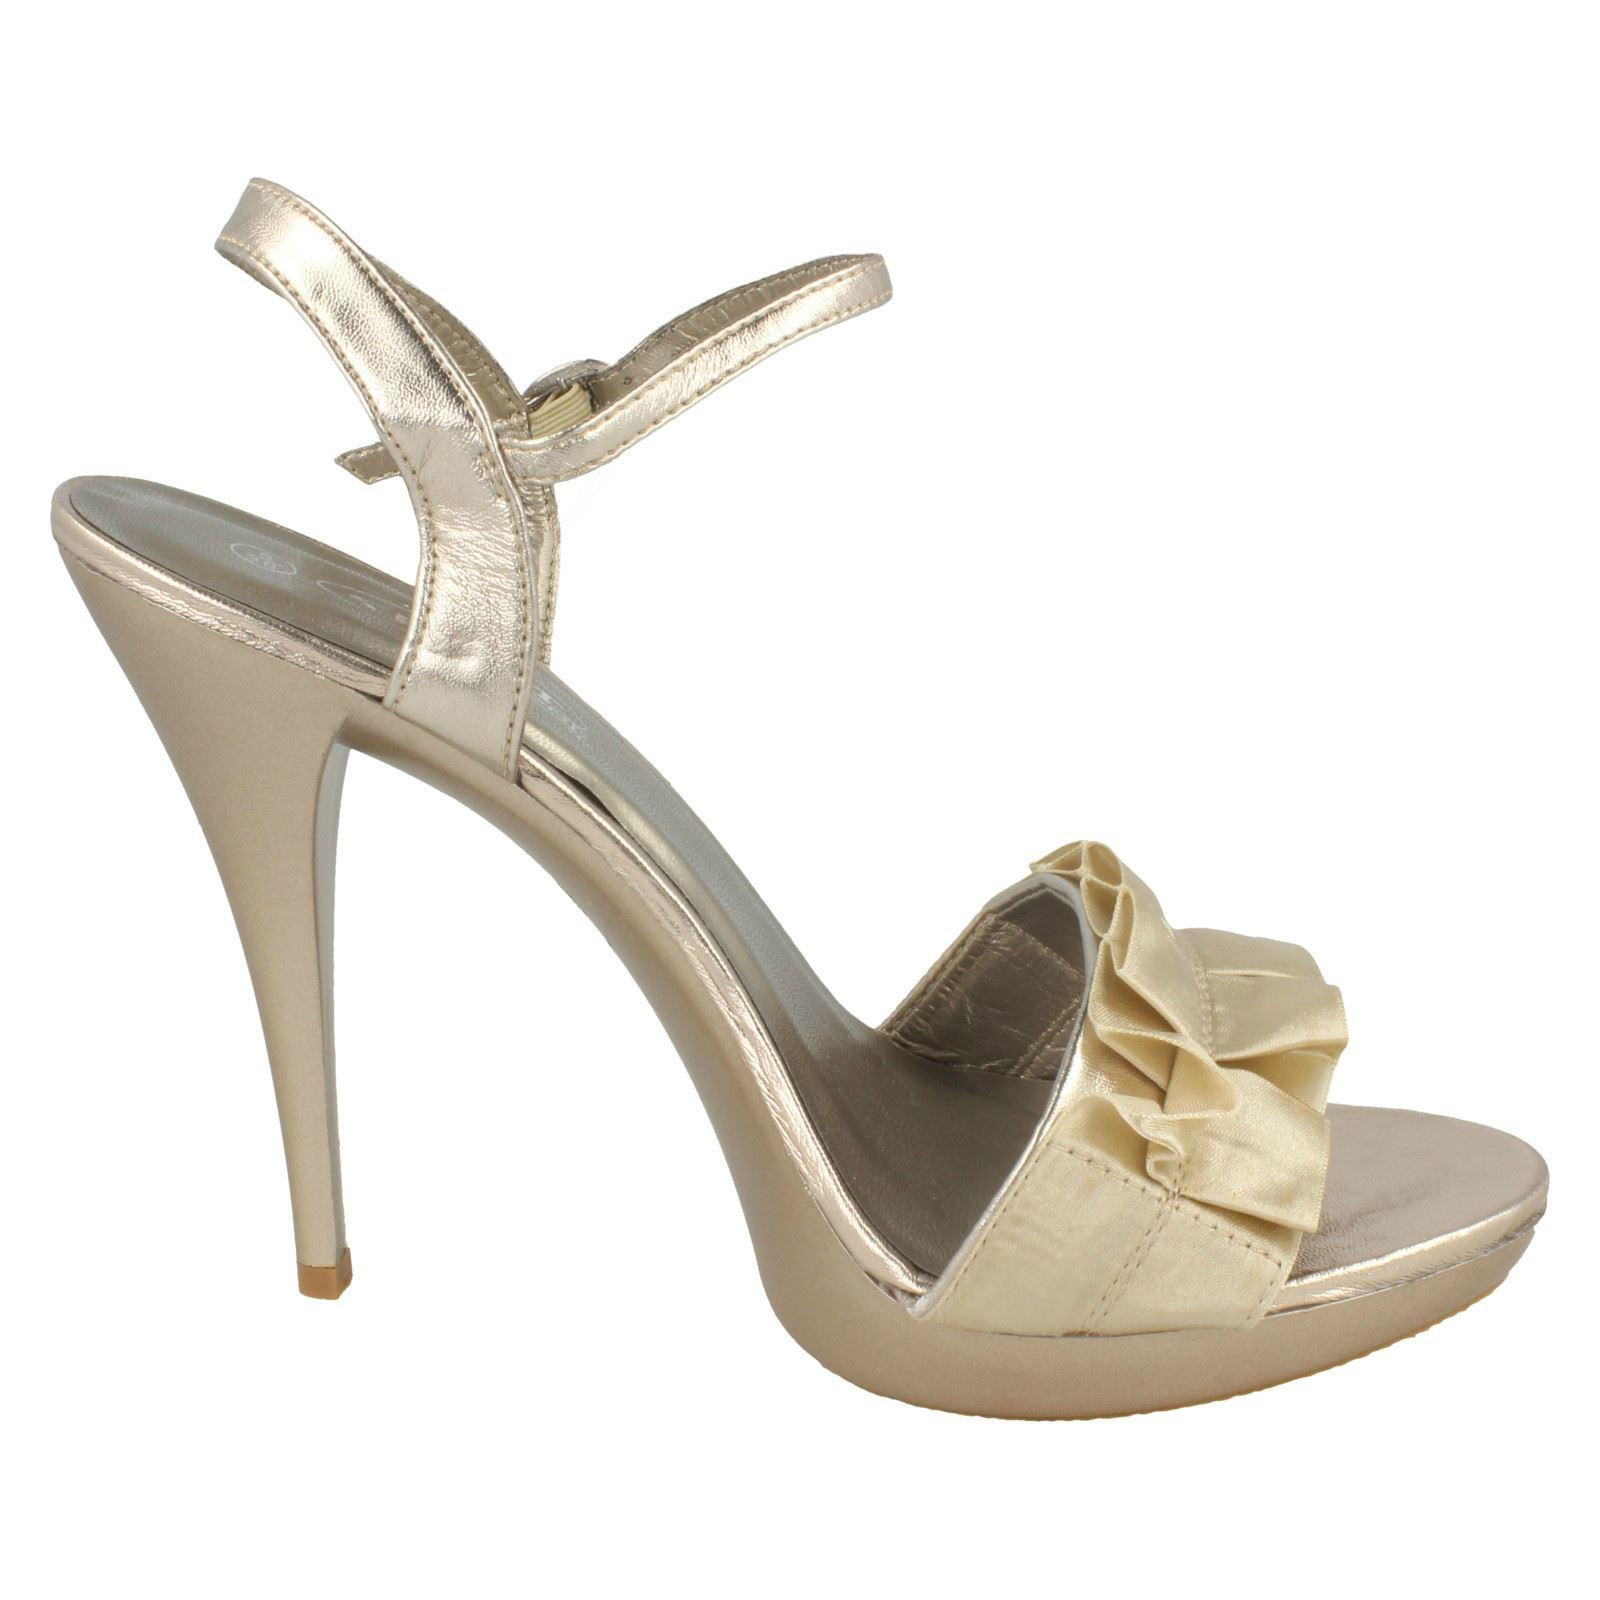 Ladies-Spot-On-Stiletto-Heel-Evening-Sandals